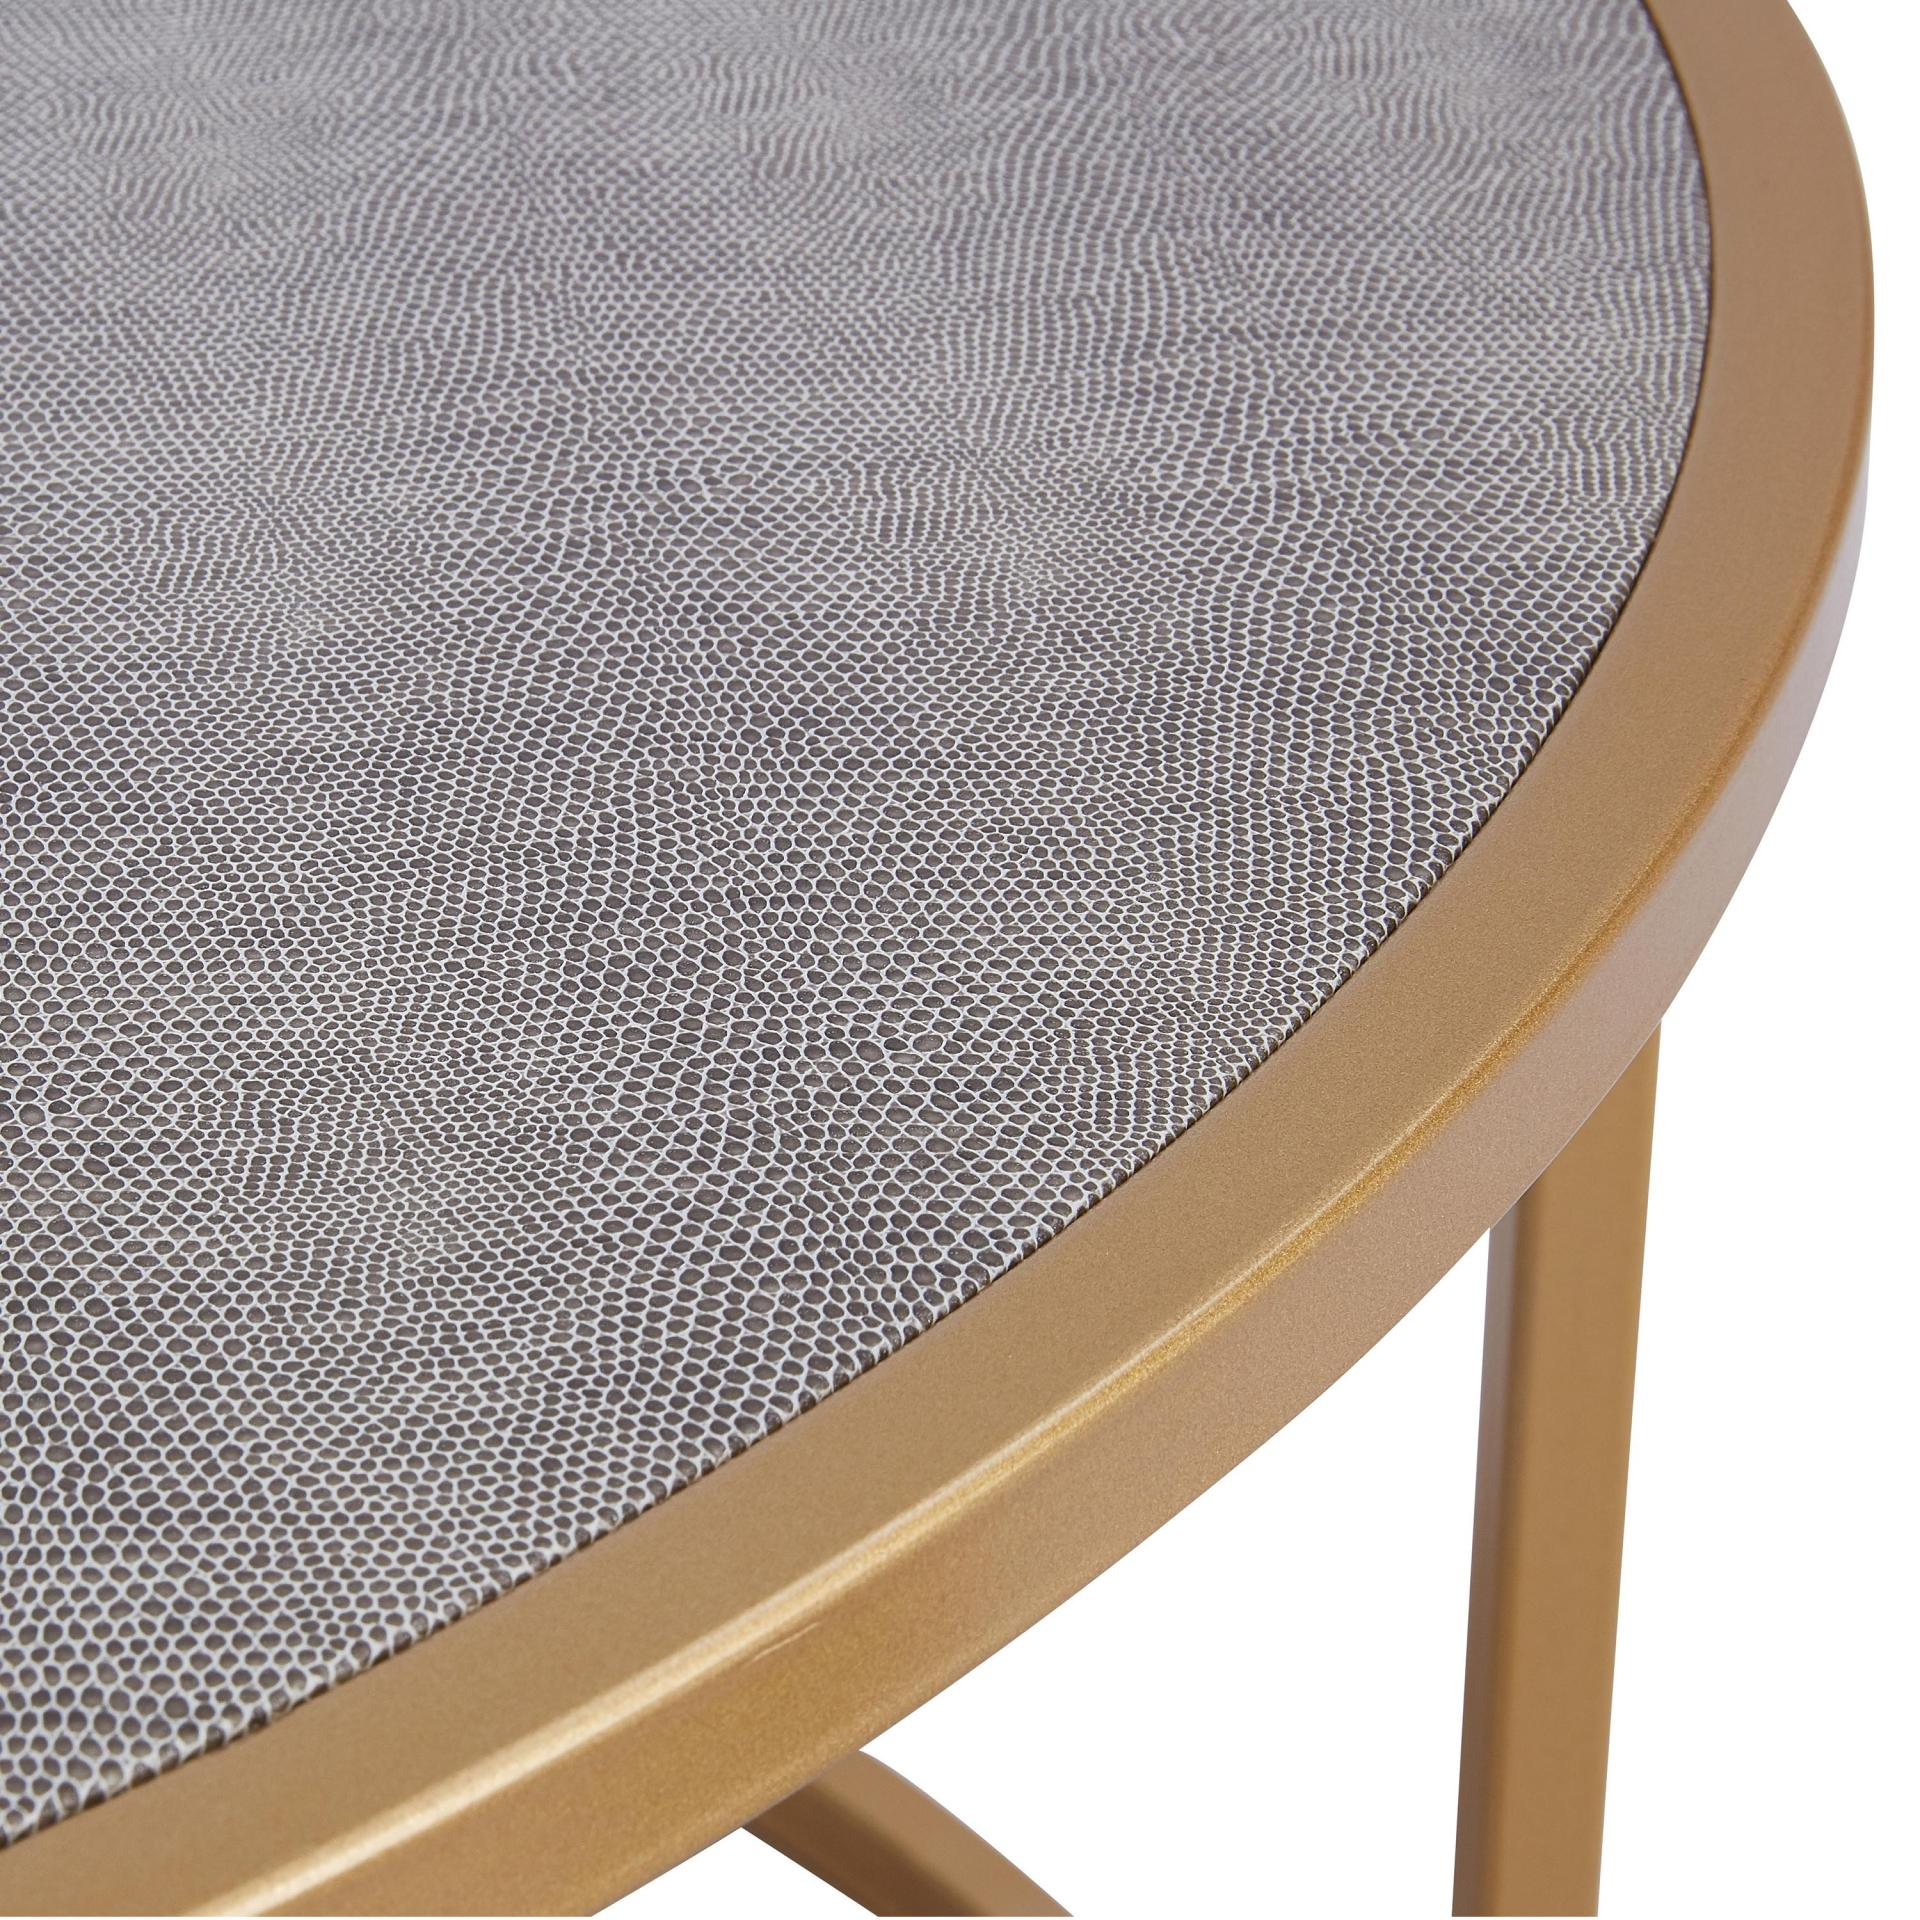 1600043 Npd Home Furniture Wholesale Lifestyle Furnishings